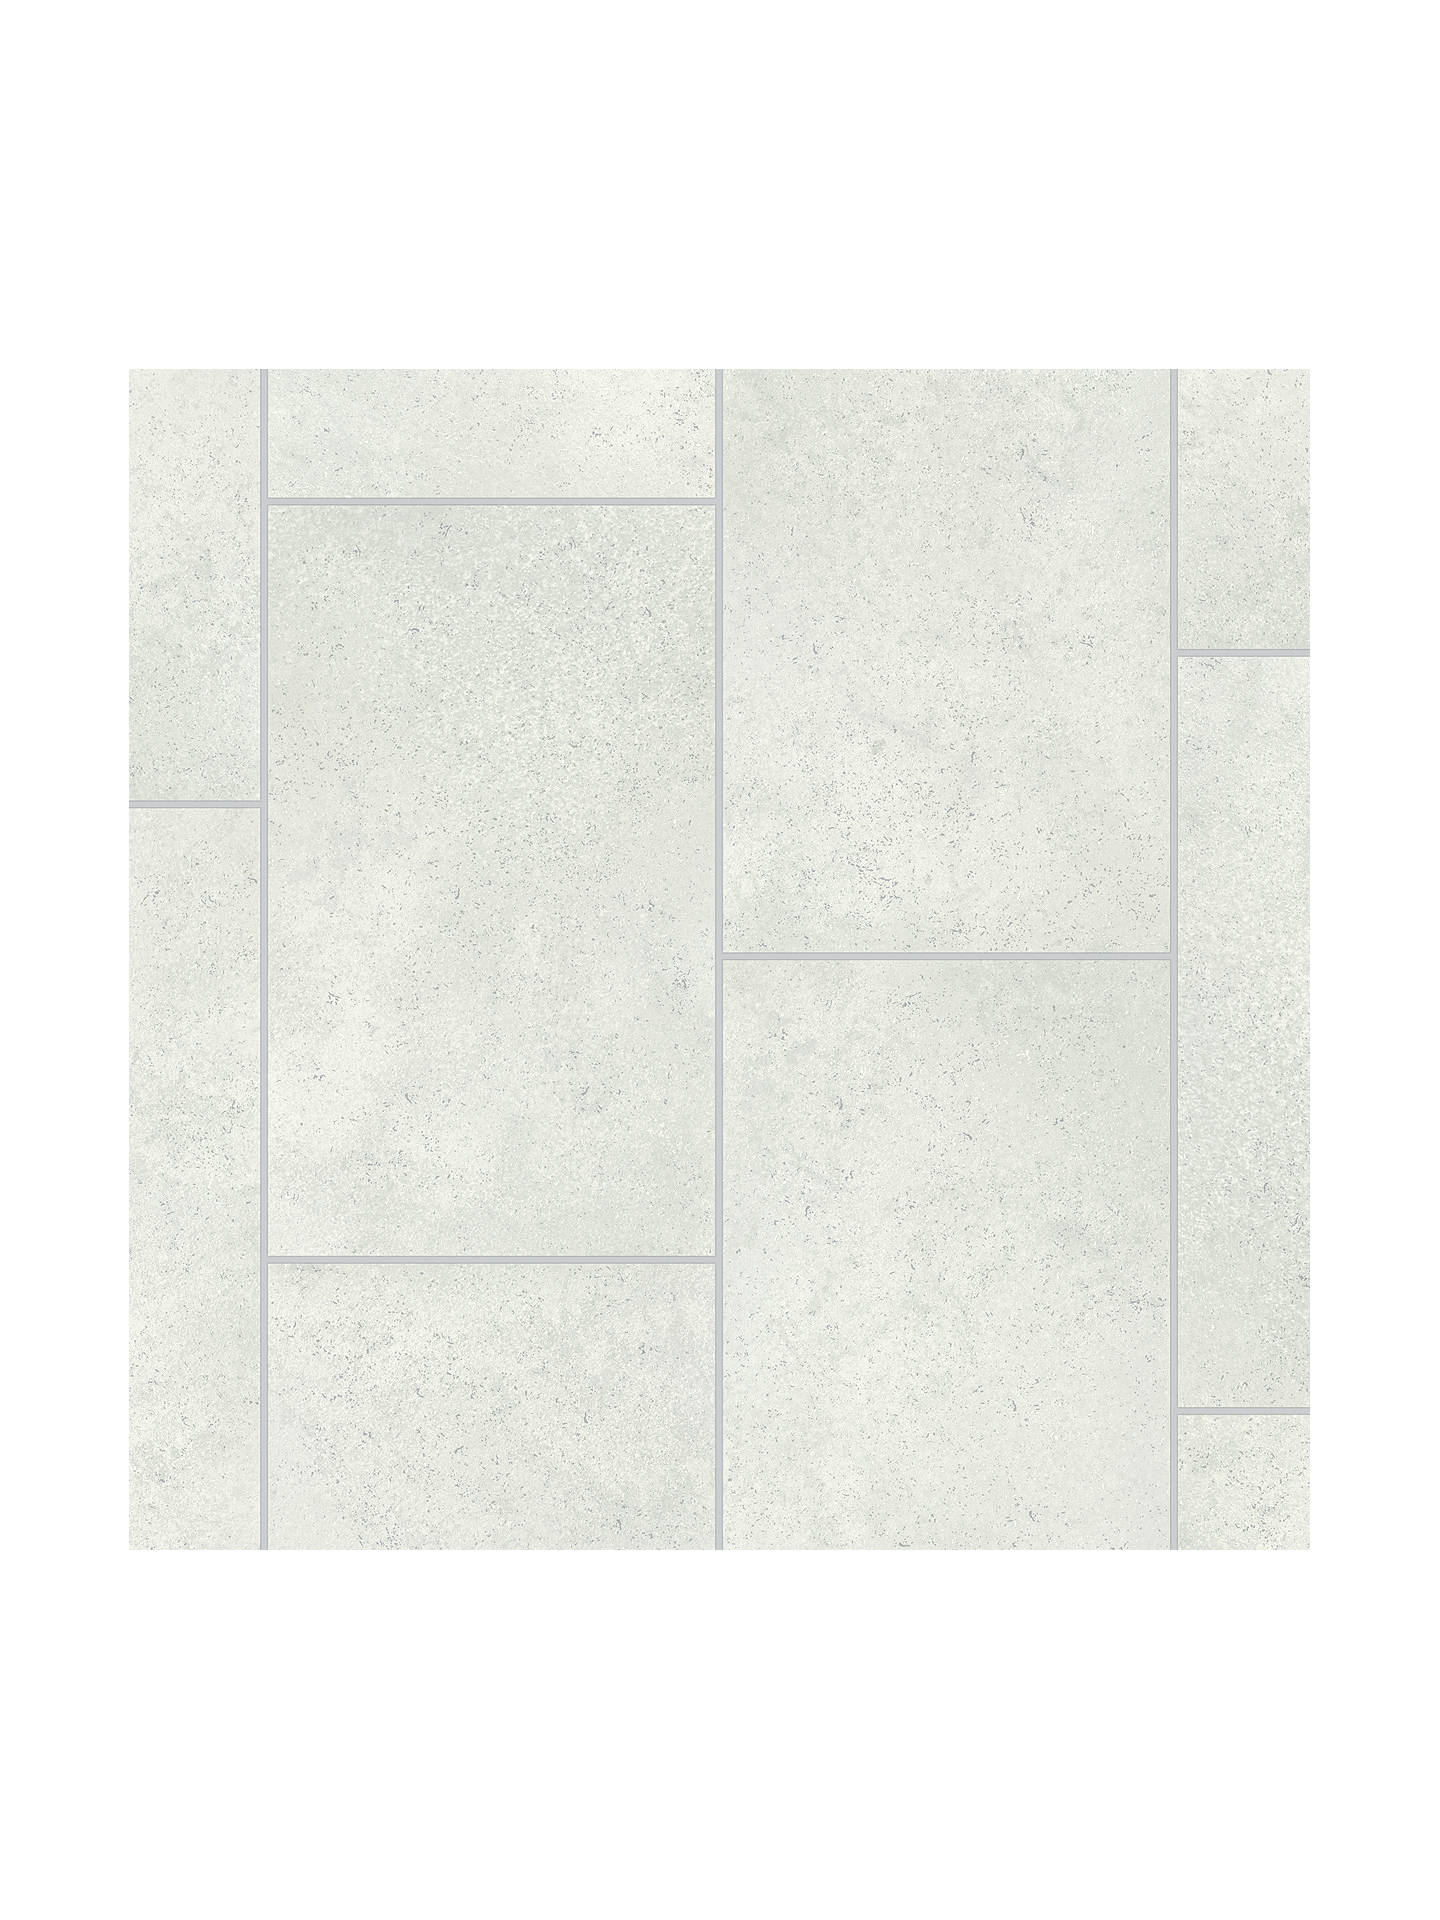 john lewis partners tile superior 10 vinyl flooring at john lewis partners. Black Bedroom Furniture Sets. Home Design Ideas